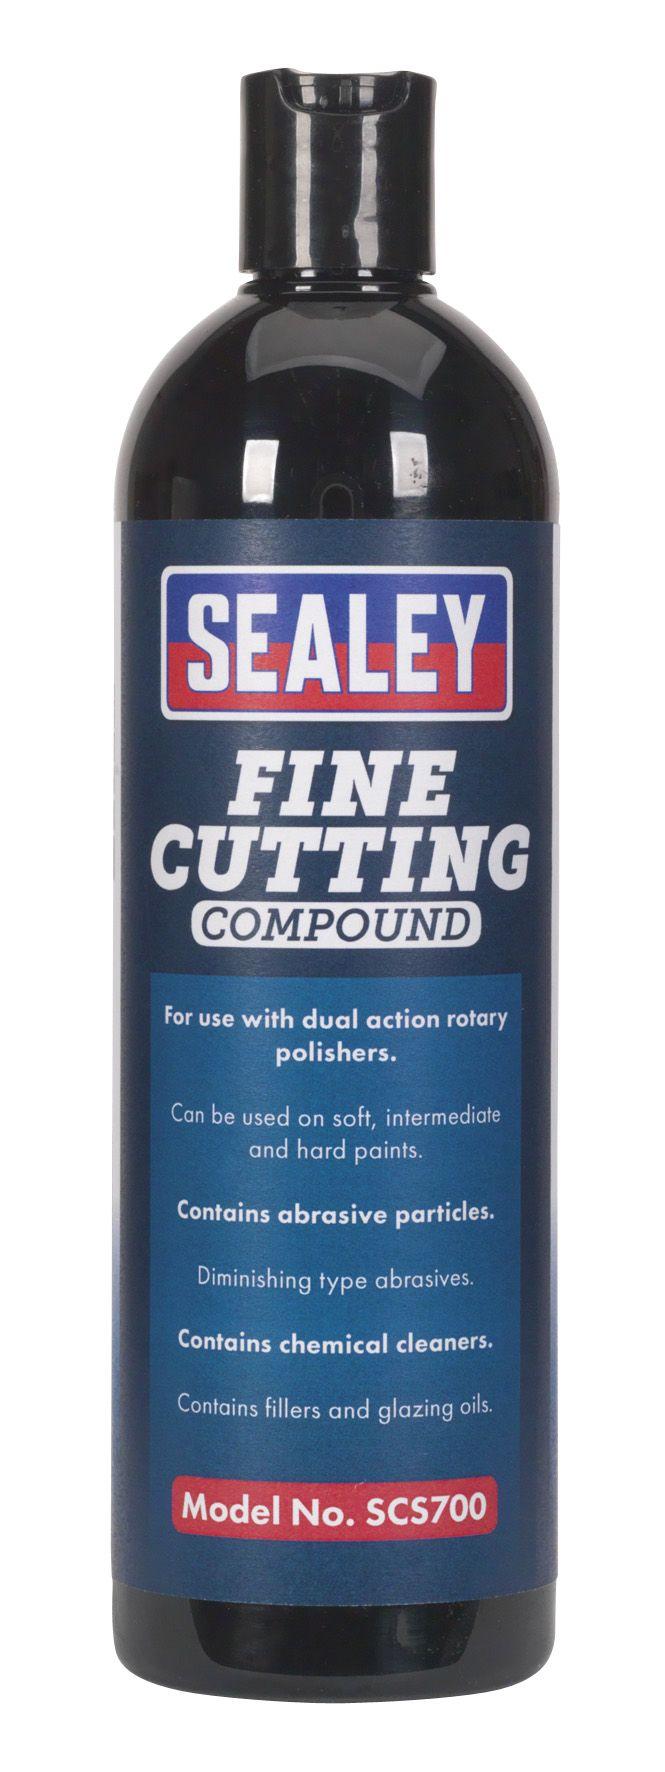 Sealey Cutting Compound Fine 500ml